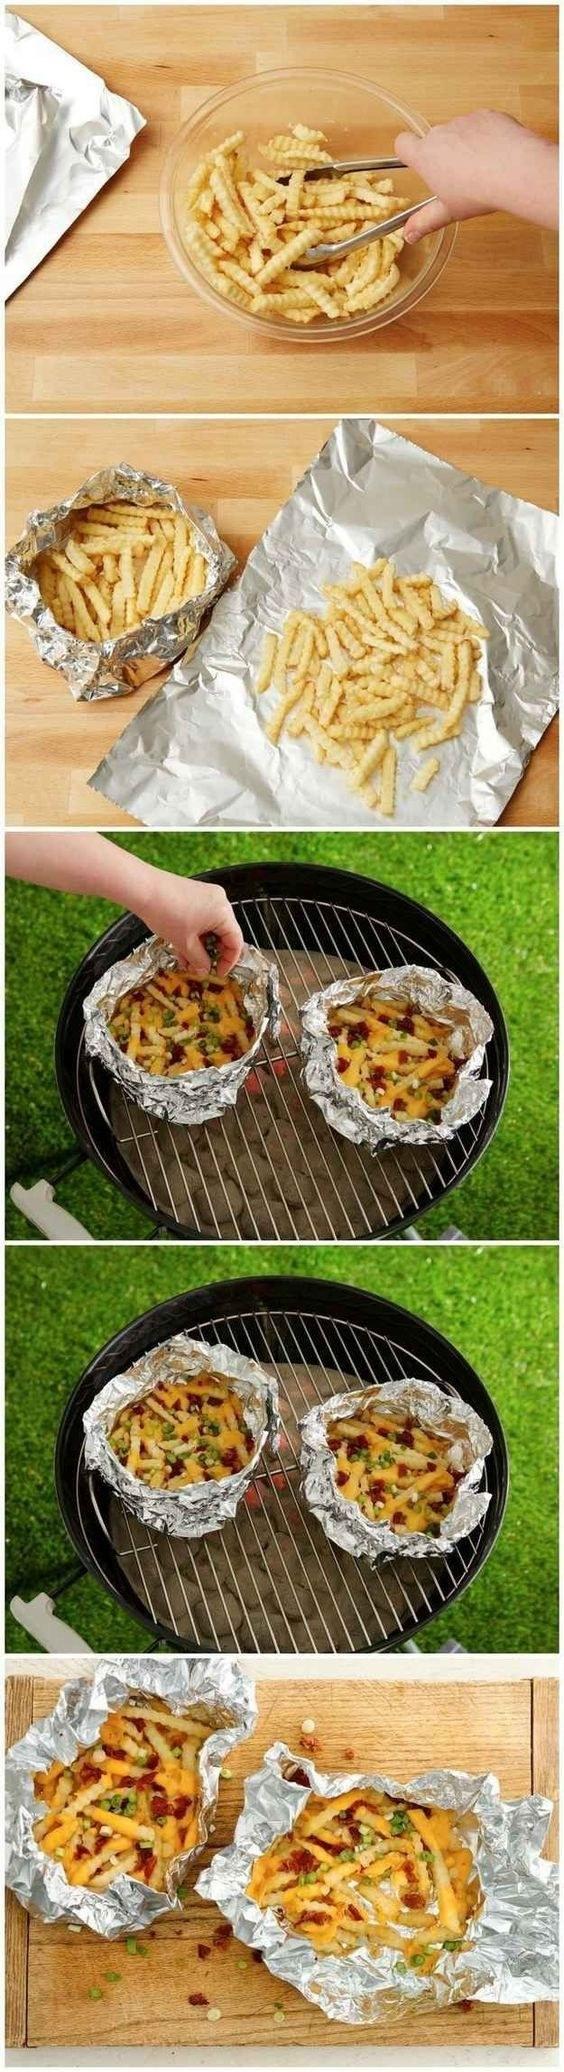 Easy campfire snack recipes